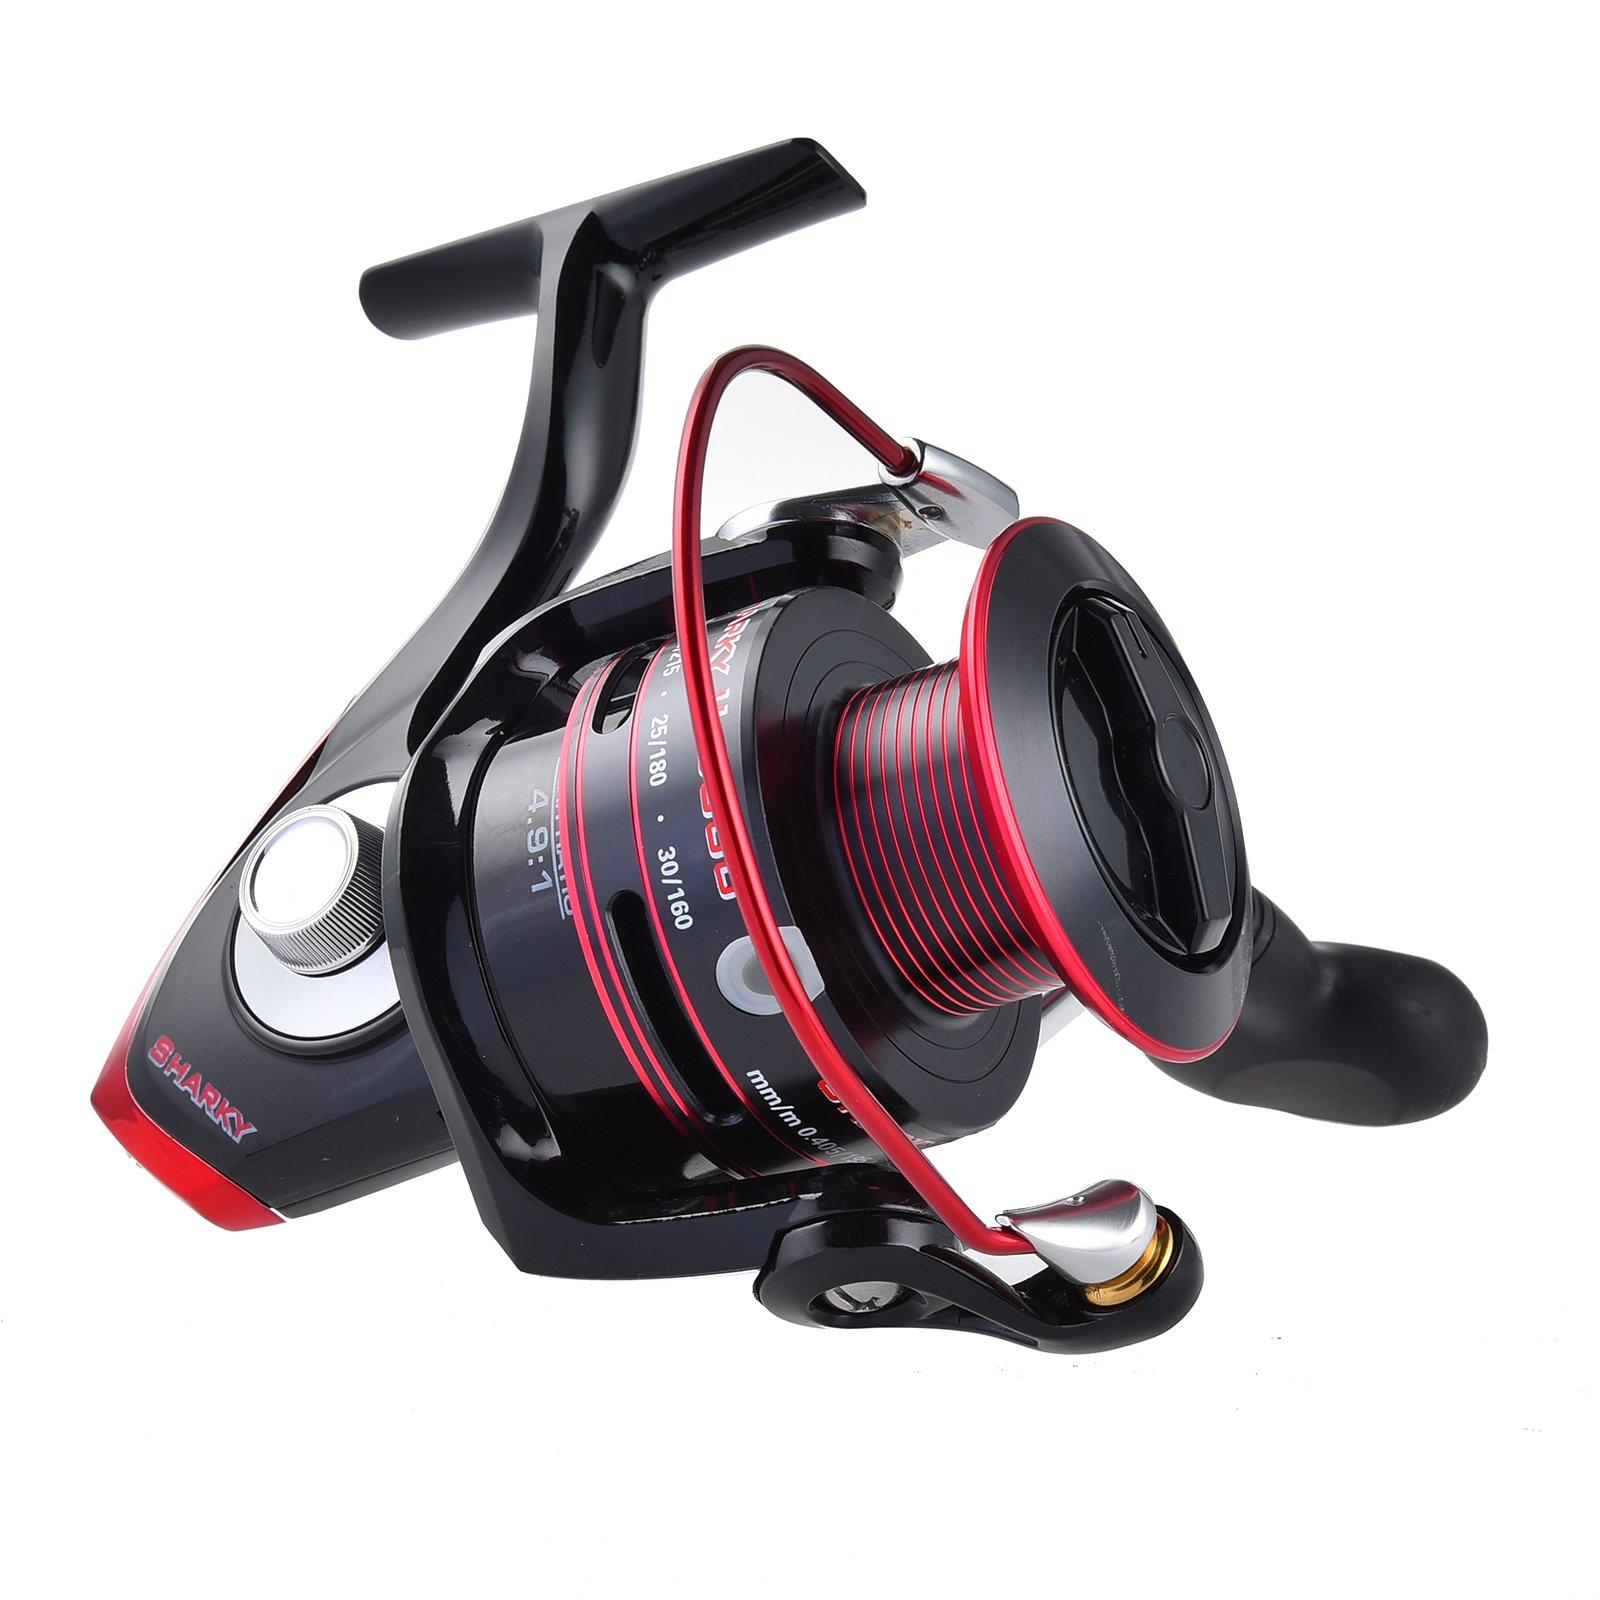 Kastking Sharky Ii Spinning Reel - Carbon Fiber 41.5 Lbs Max Drag Brass Gears.. 16